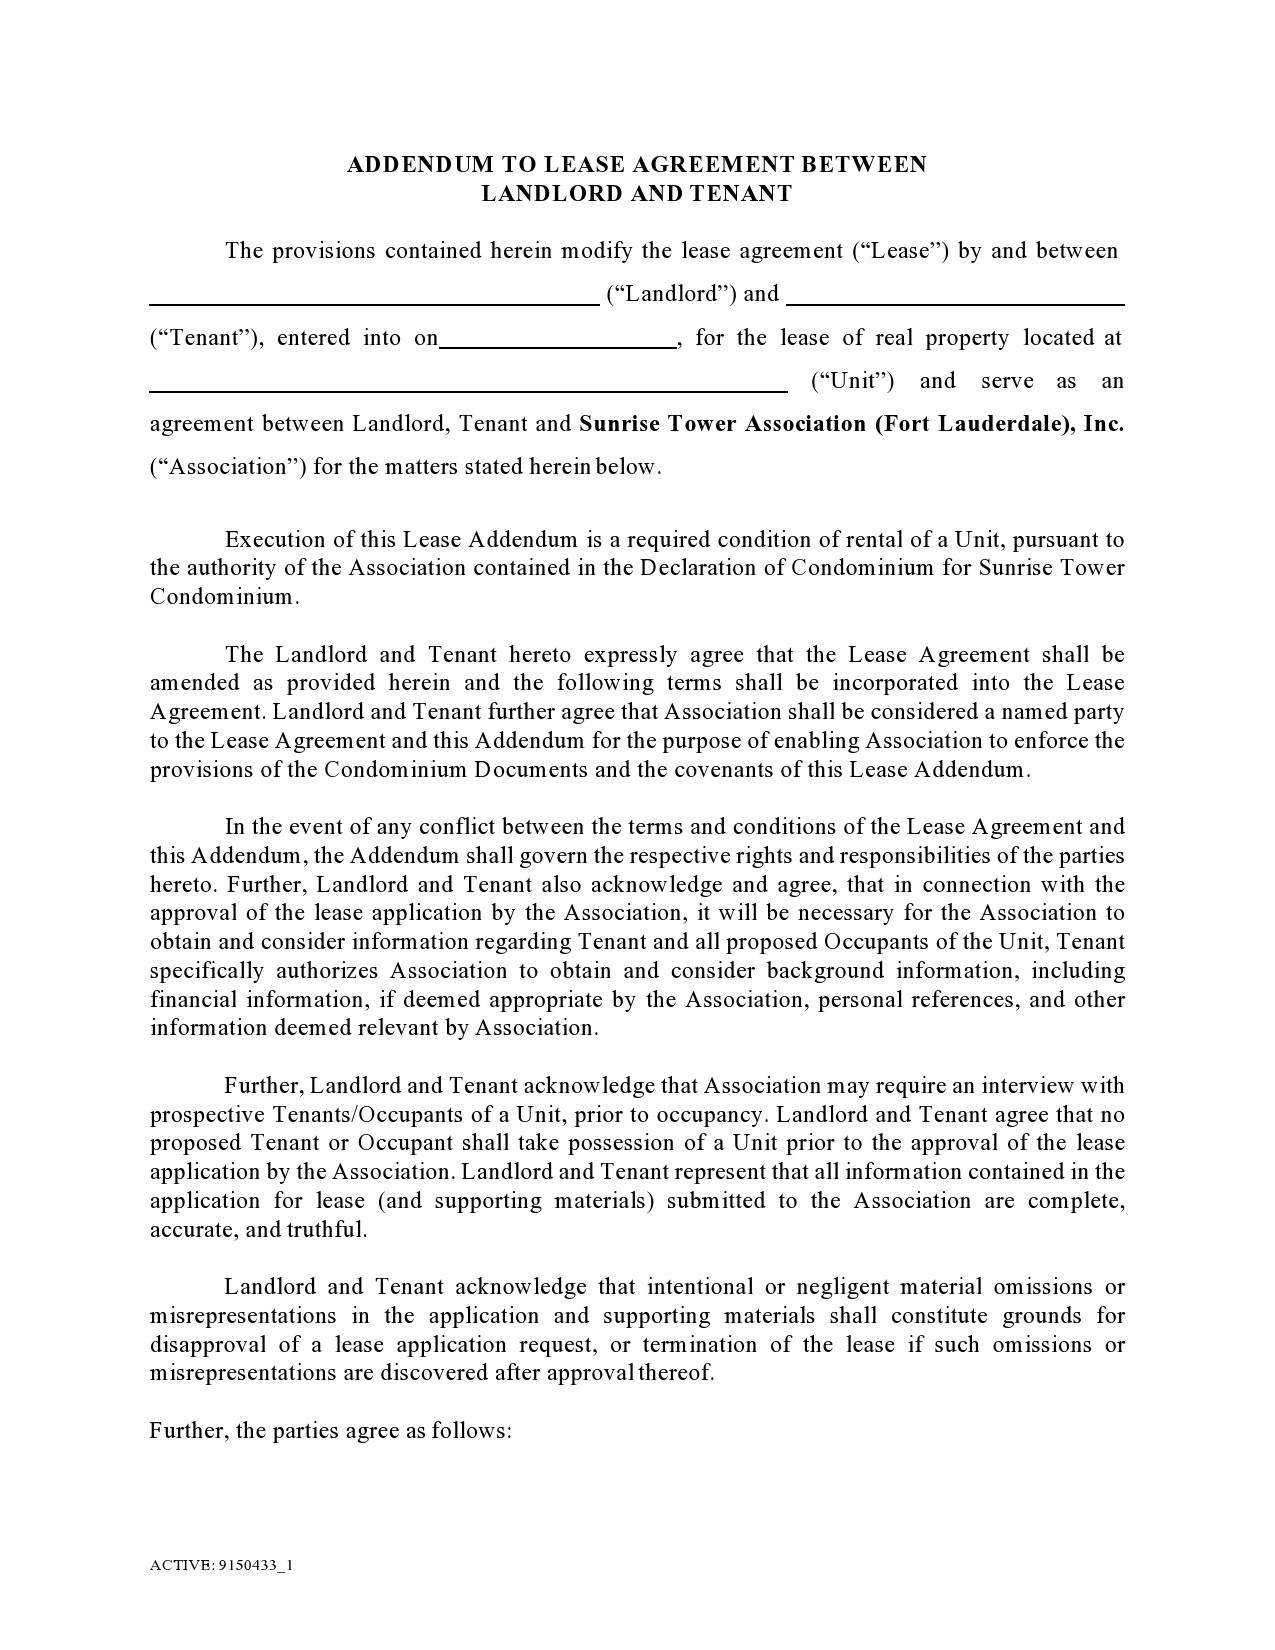 Free lease extension addendum 37